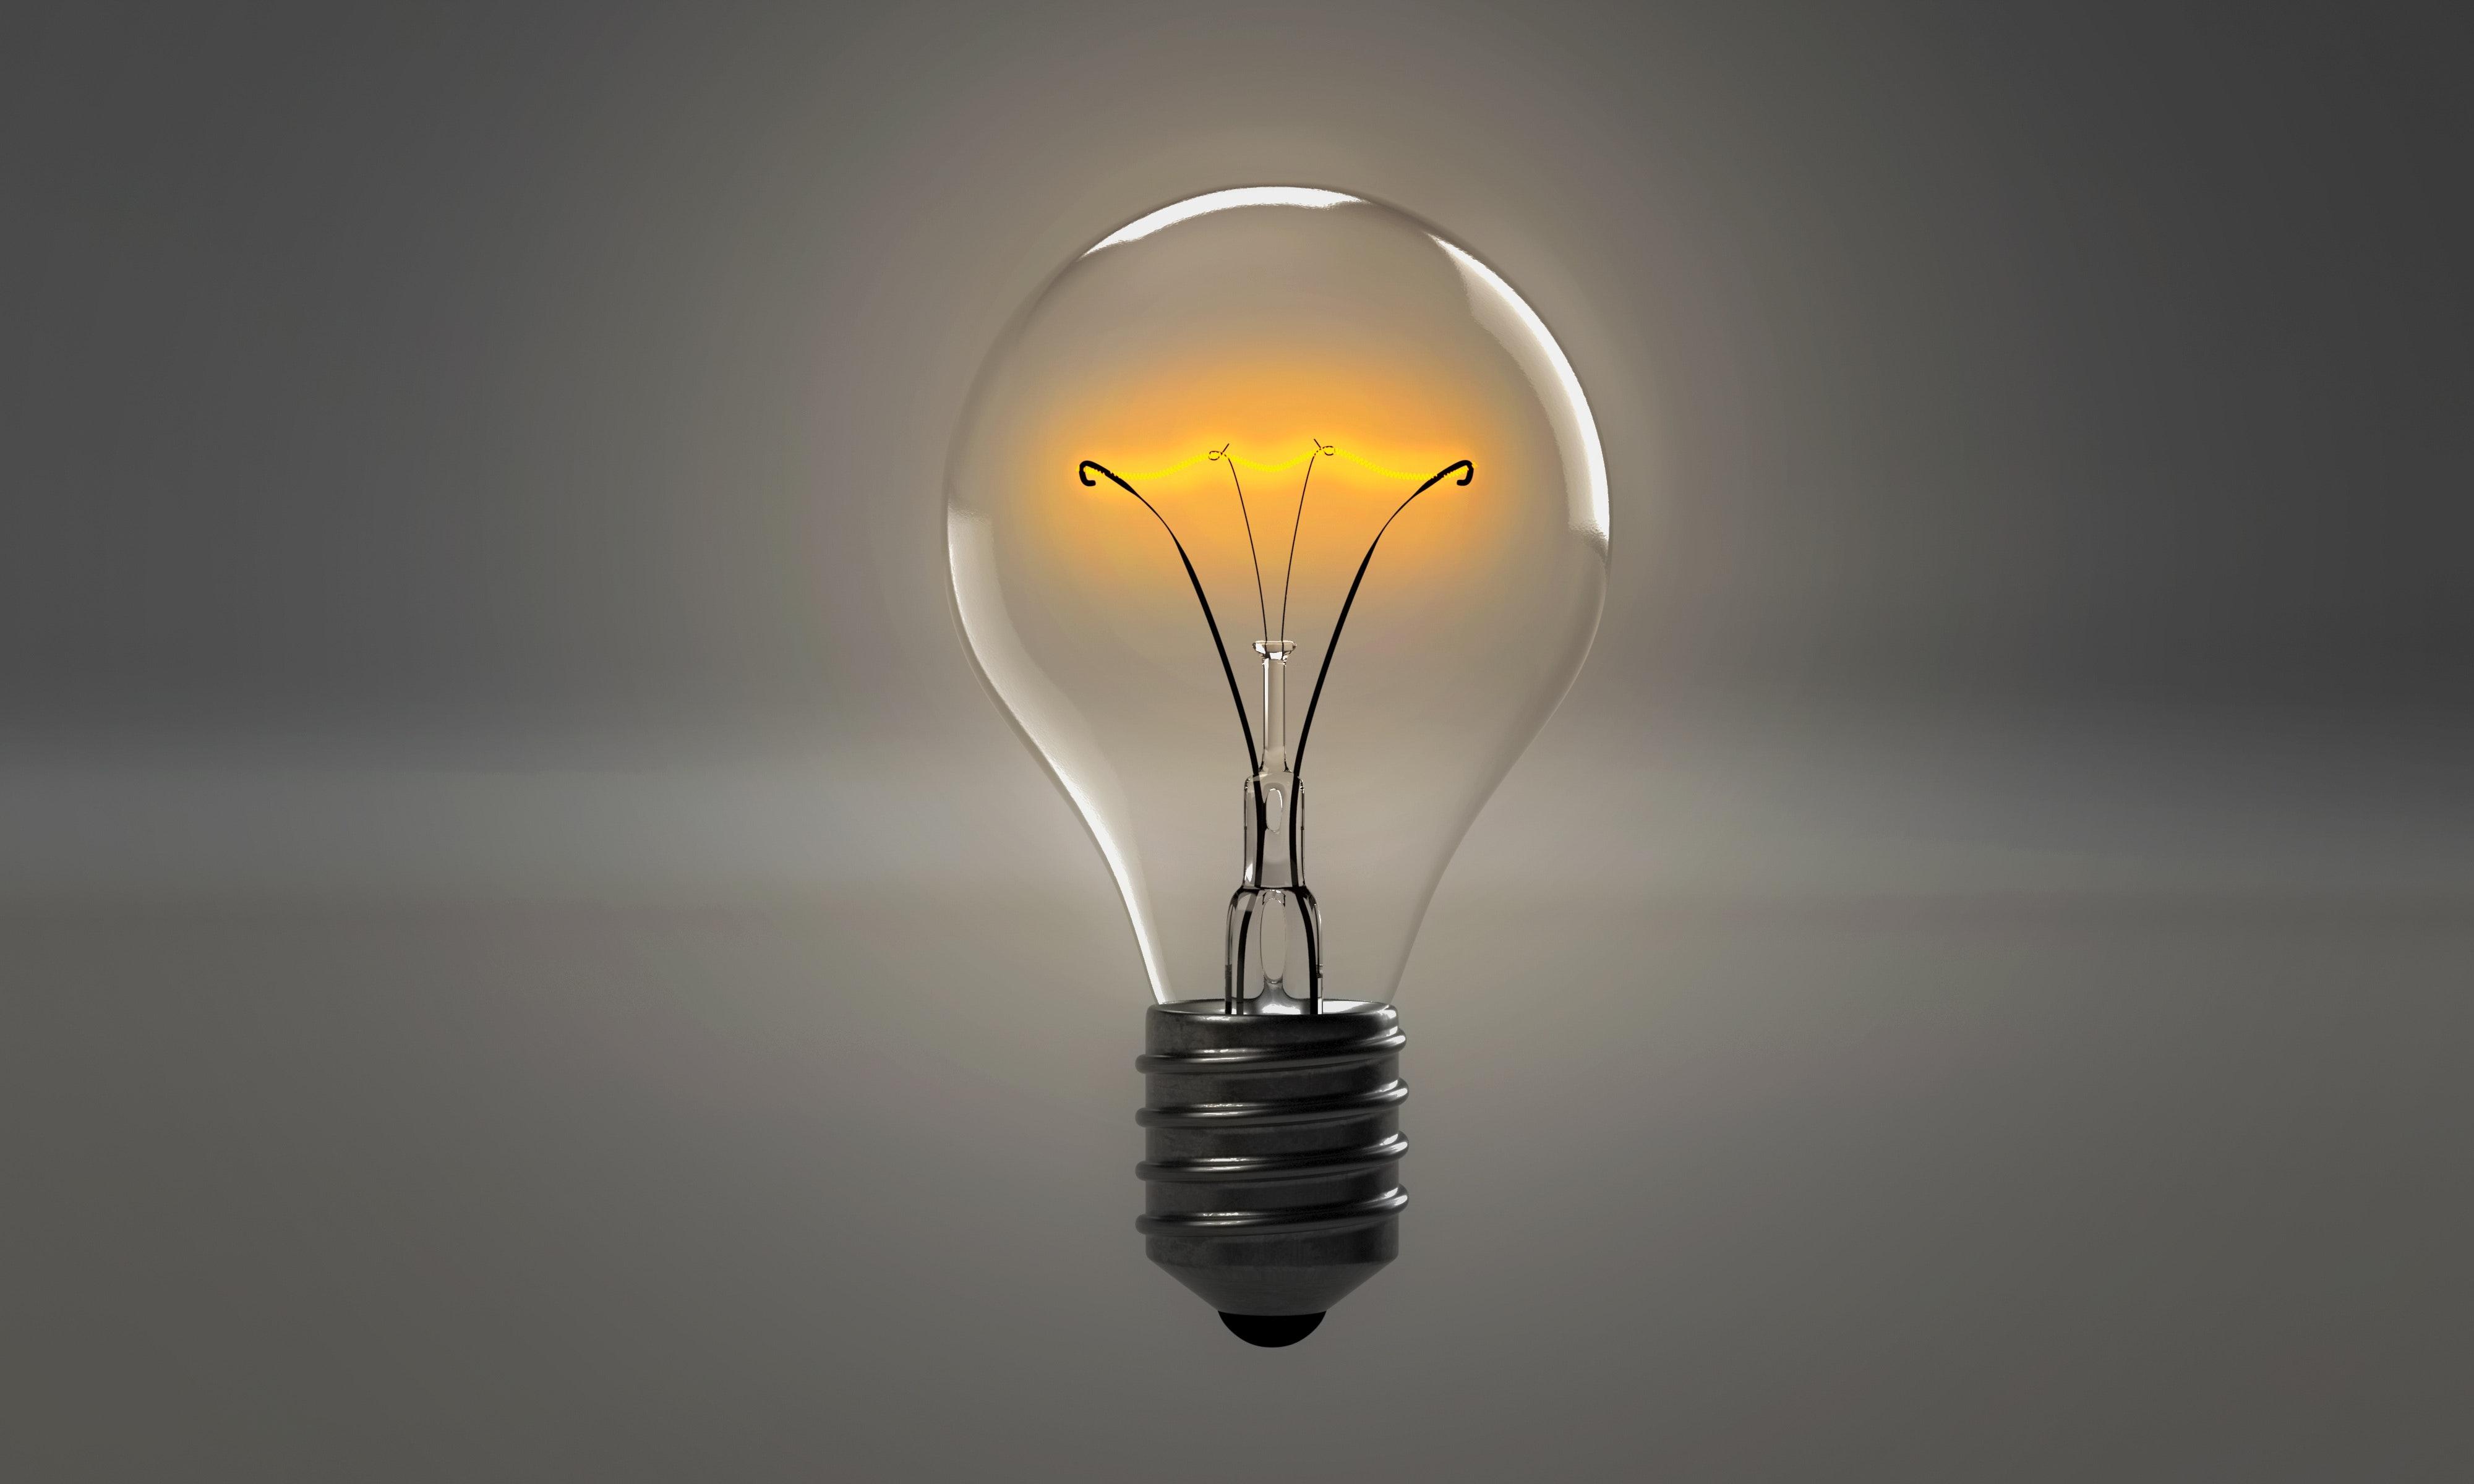 lighting lightbulb wallpaper light photography en glass love incandescent product bulb blue heart nature macro bulbs